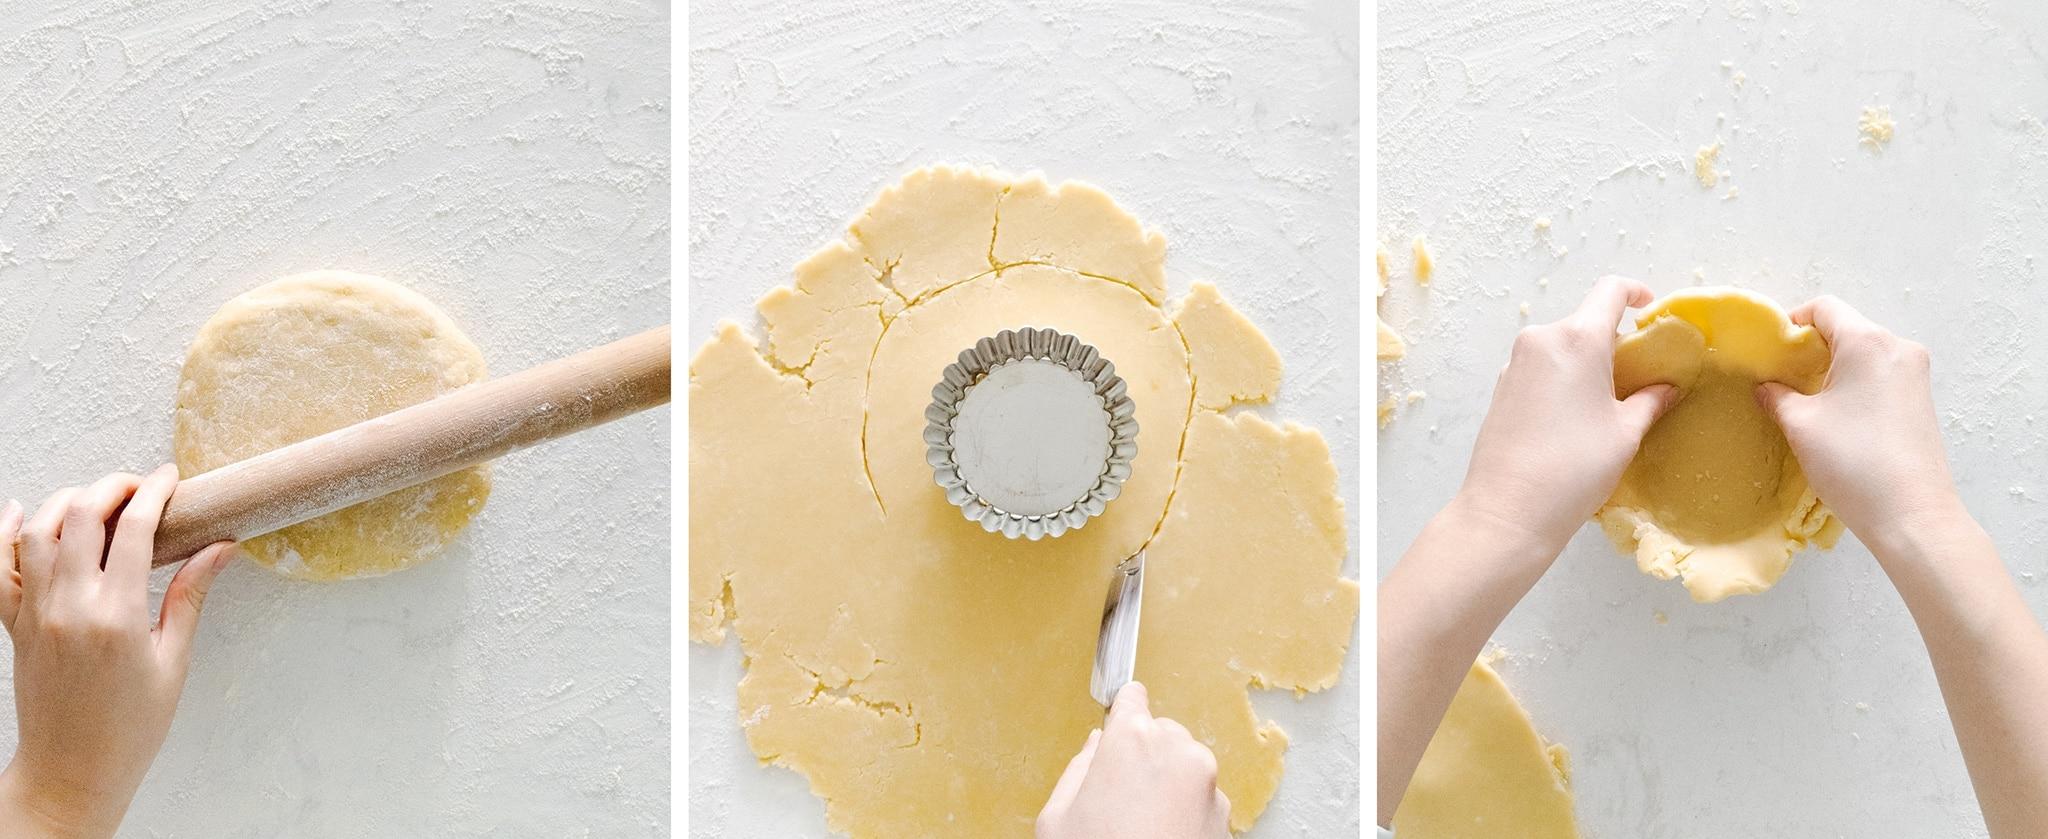 Rolling shortcrust dough for mini tart shells